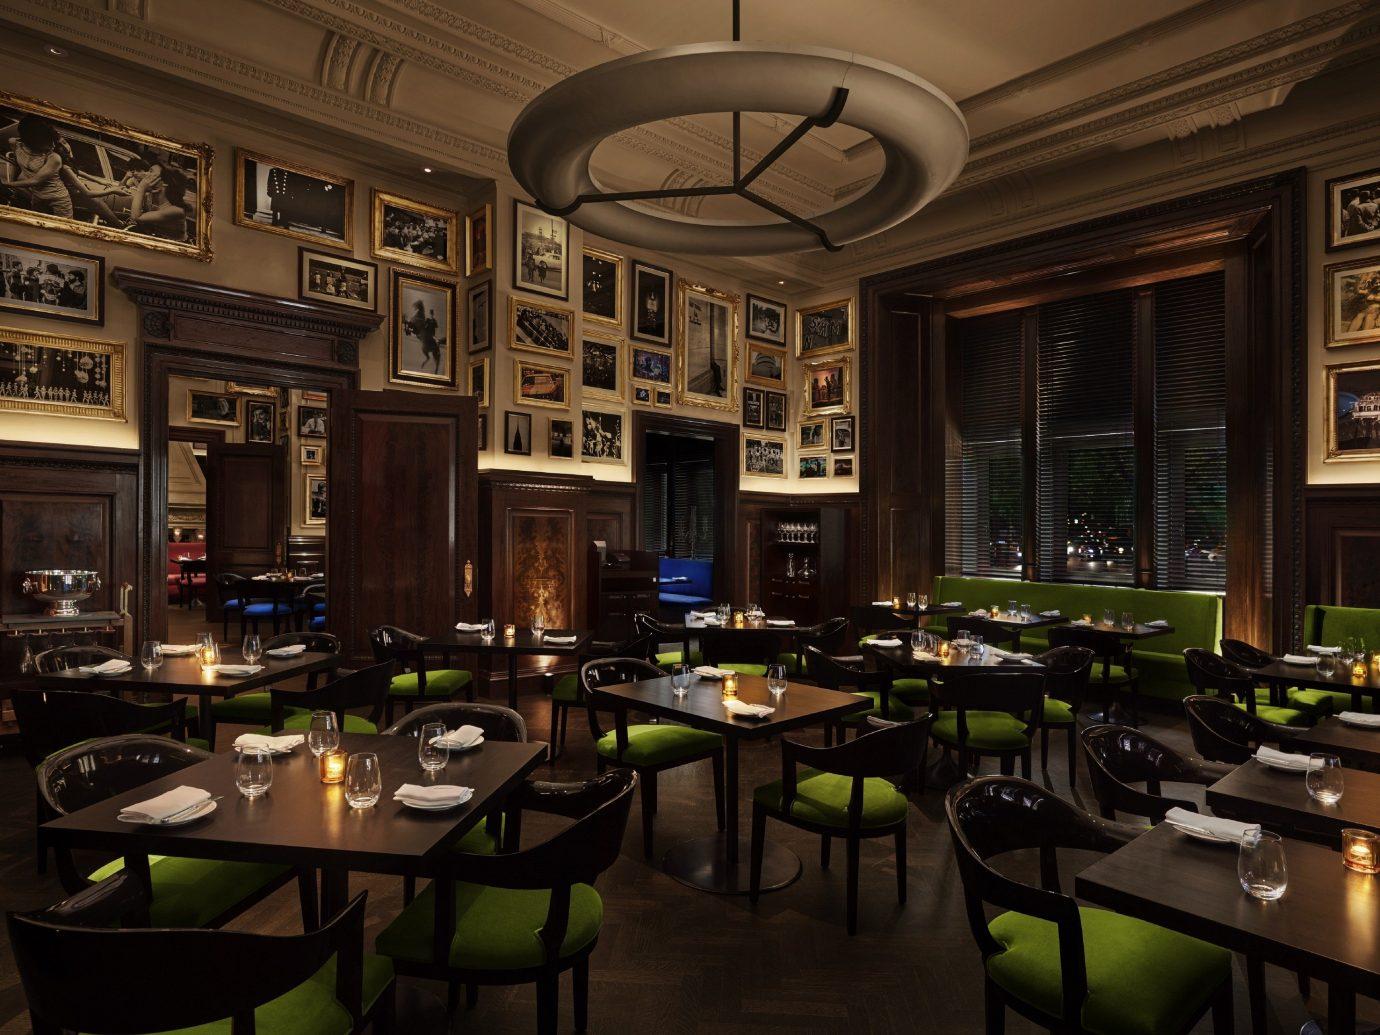 Food + Drink Romance indoor table window ceiling room estate Bar restaurant interior design lighting meal furniture several Island